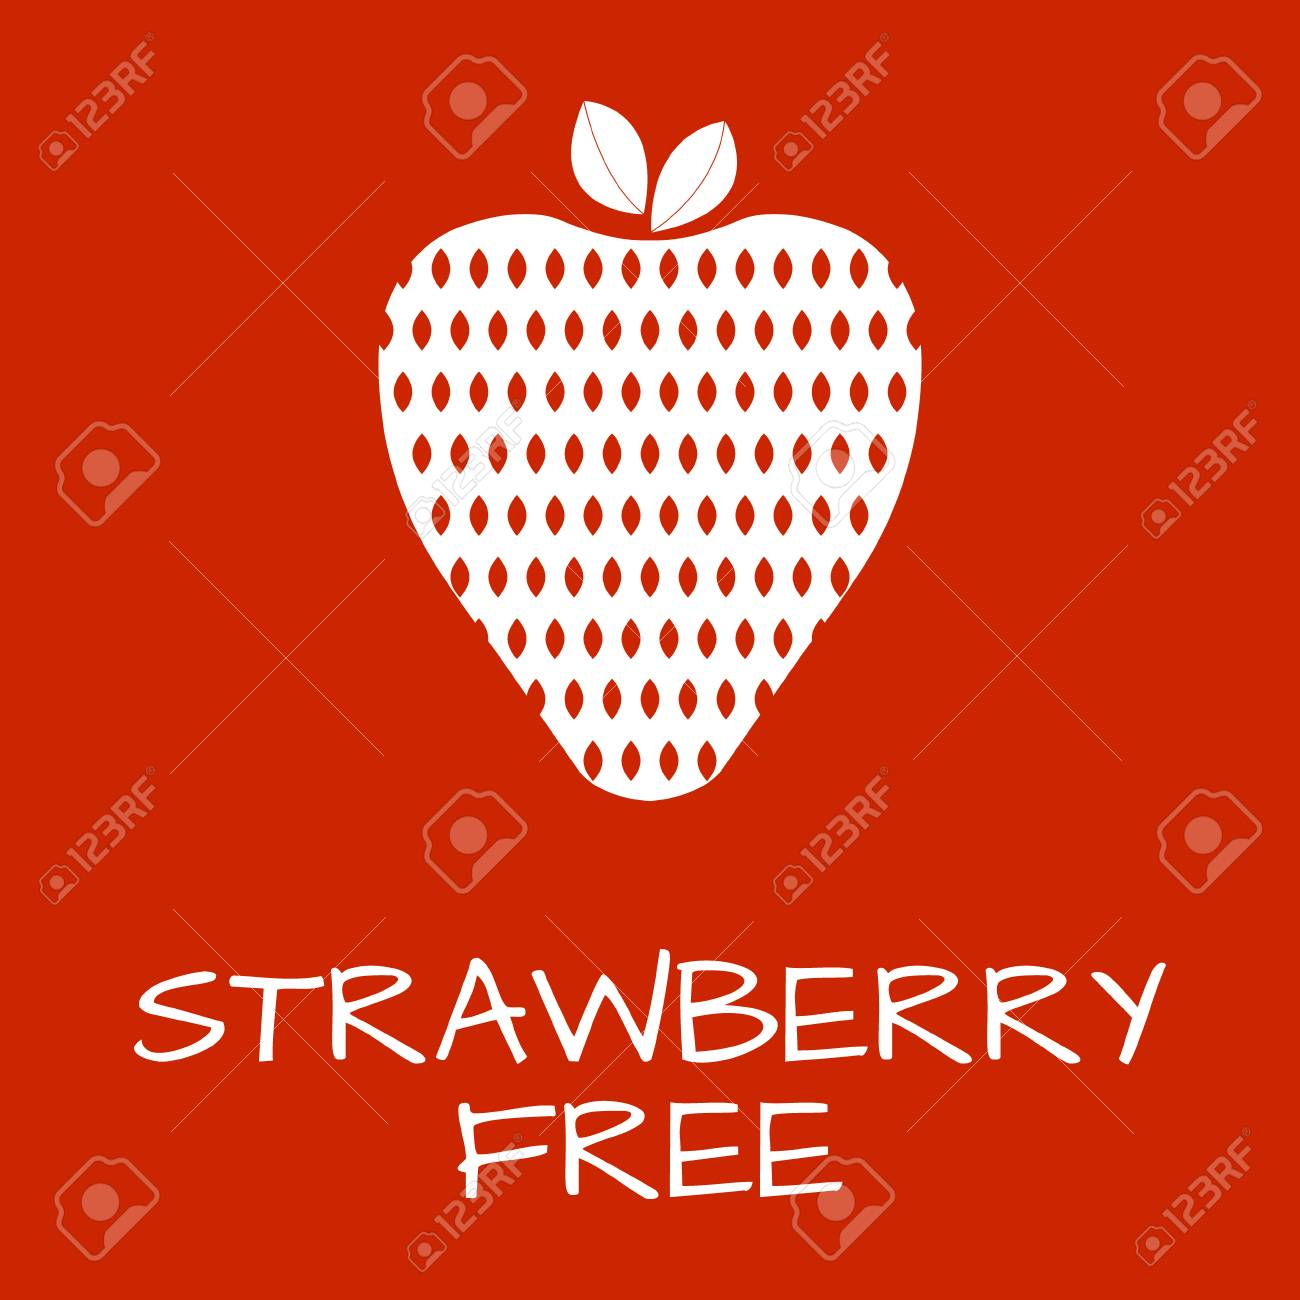 Strawberry free label food intolerance symbols vector strawberry free label food intolerance symbols vector illustration stock vector 61706205 biocorpaavc Images